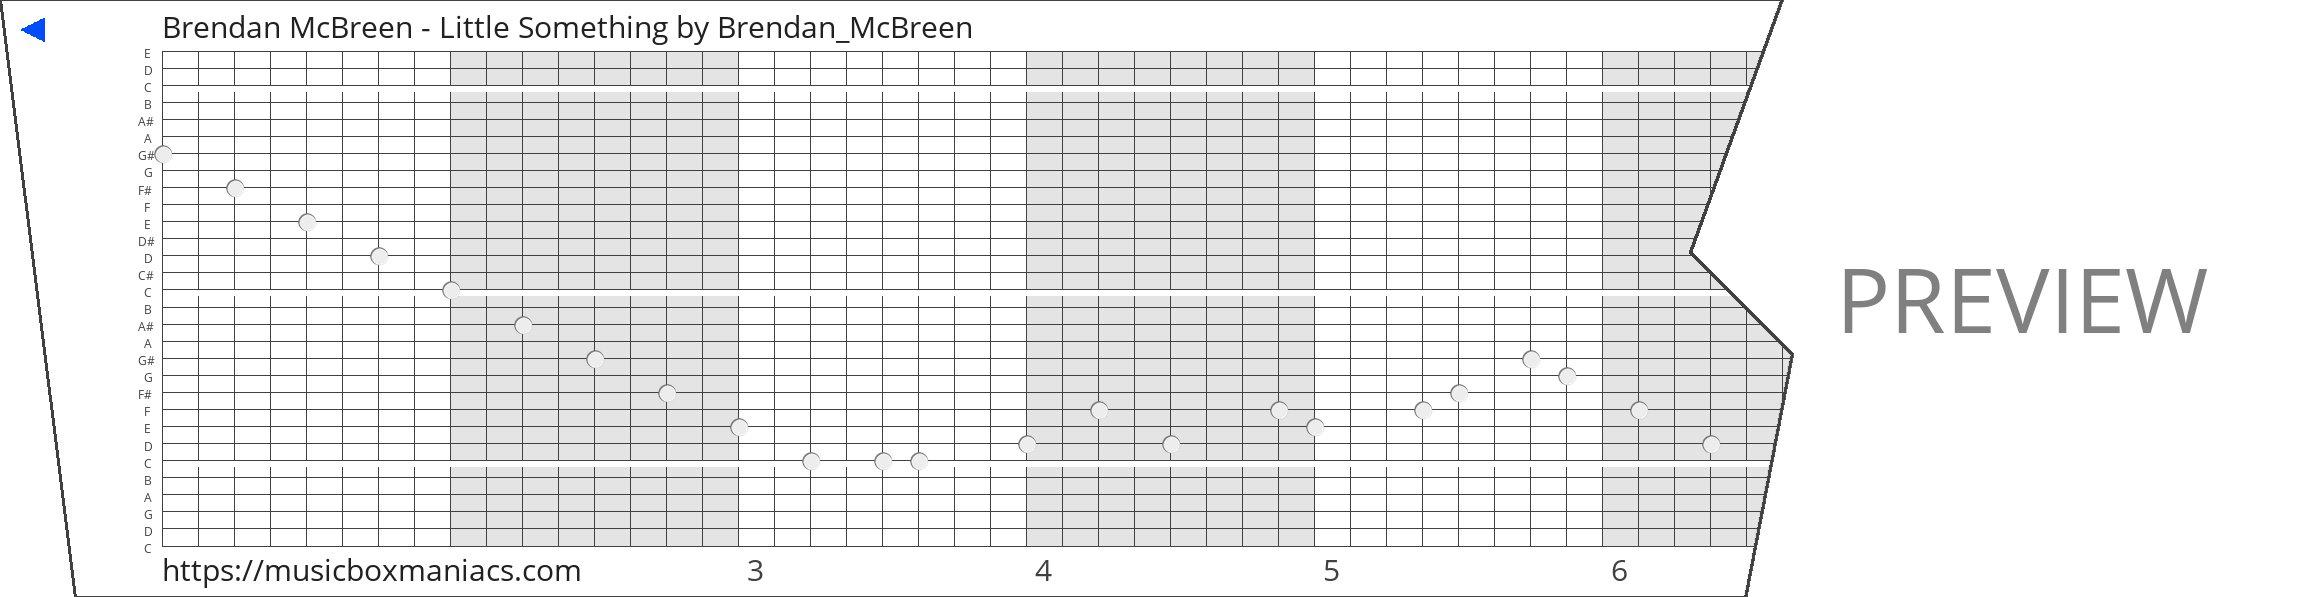 Brendan McBreen - Little Something 30 note music box paper strip